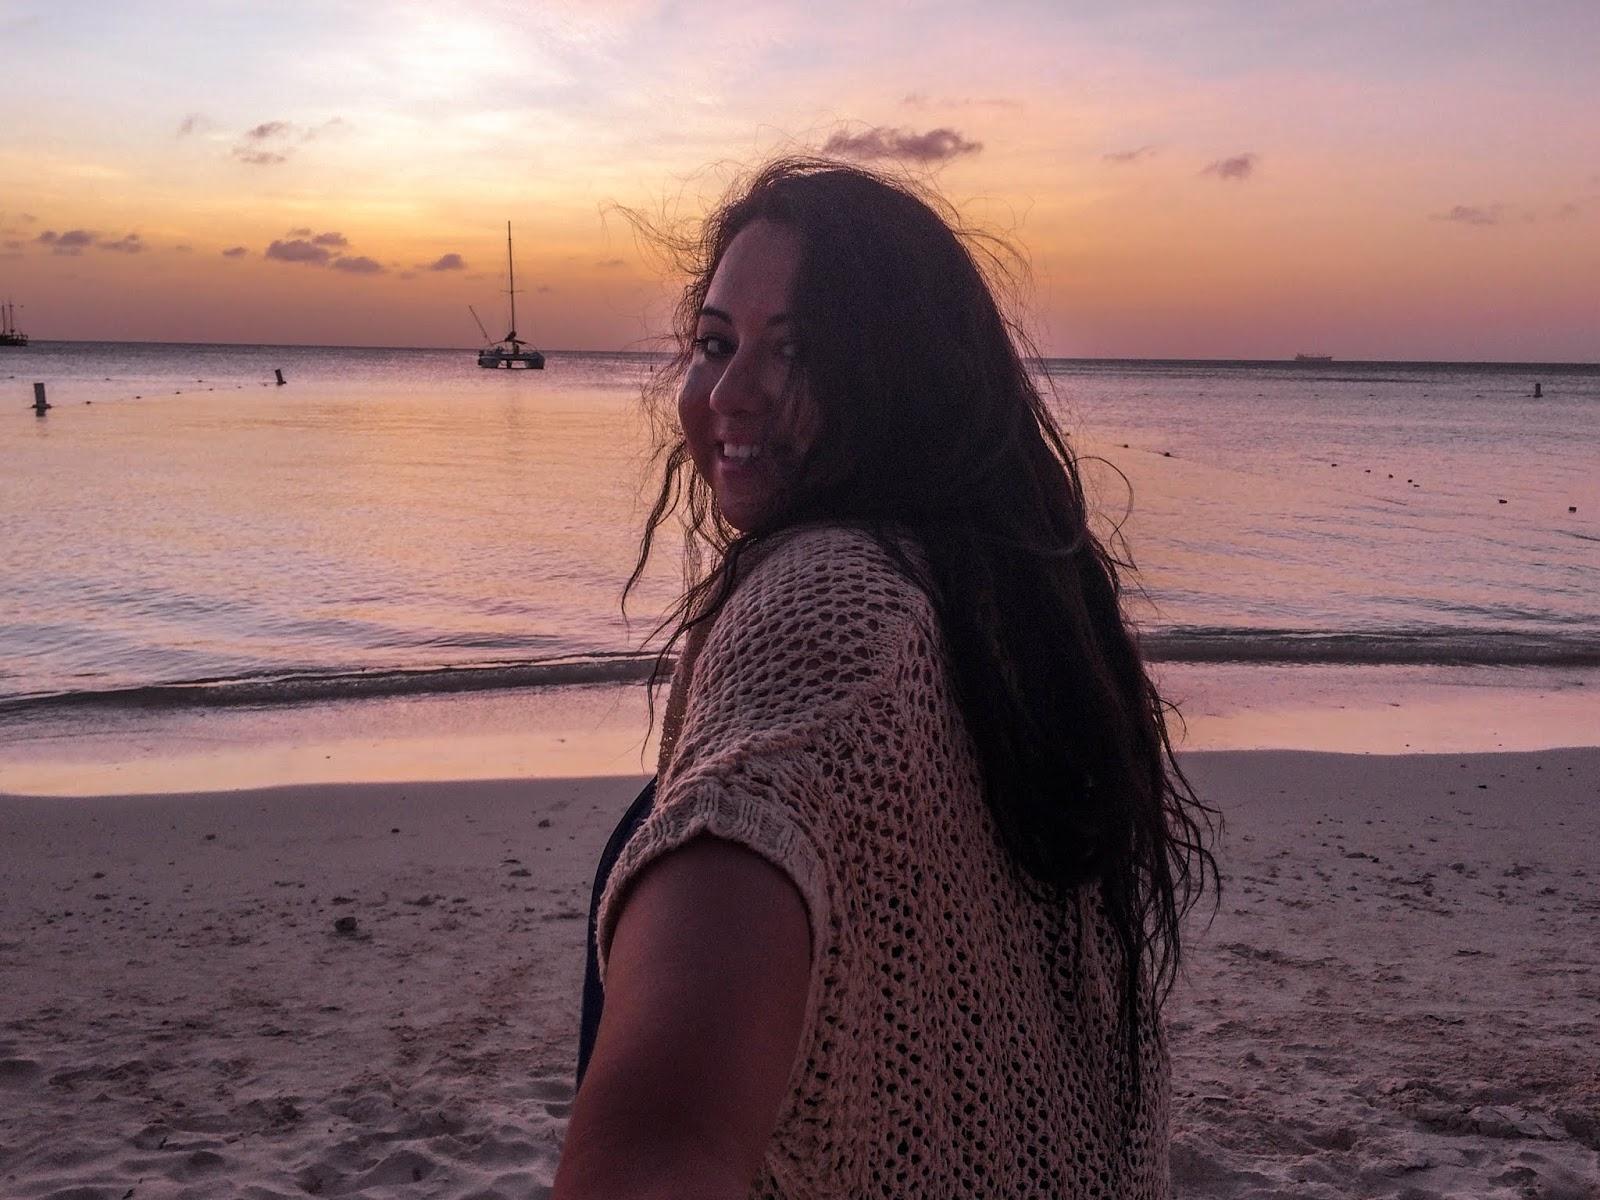 Latina Travel Blogger, WanderlustBeautyDreams